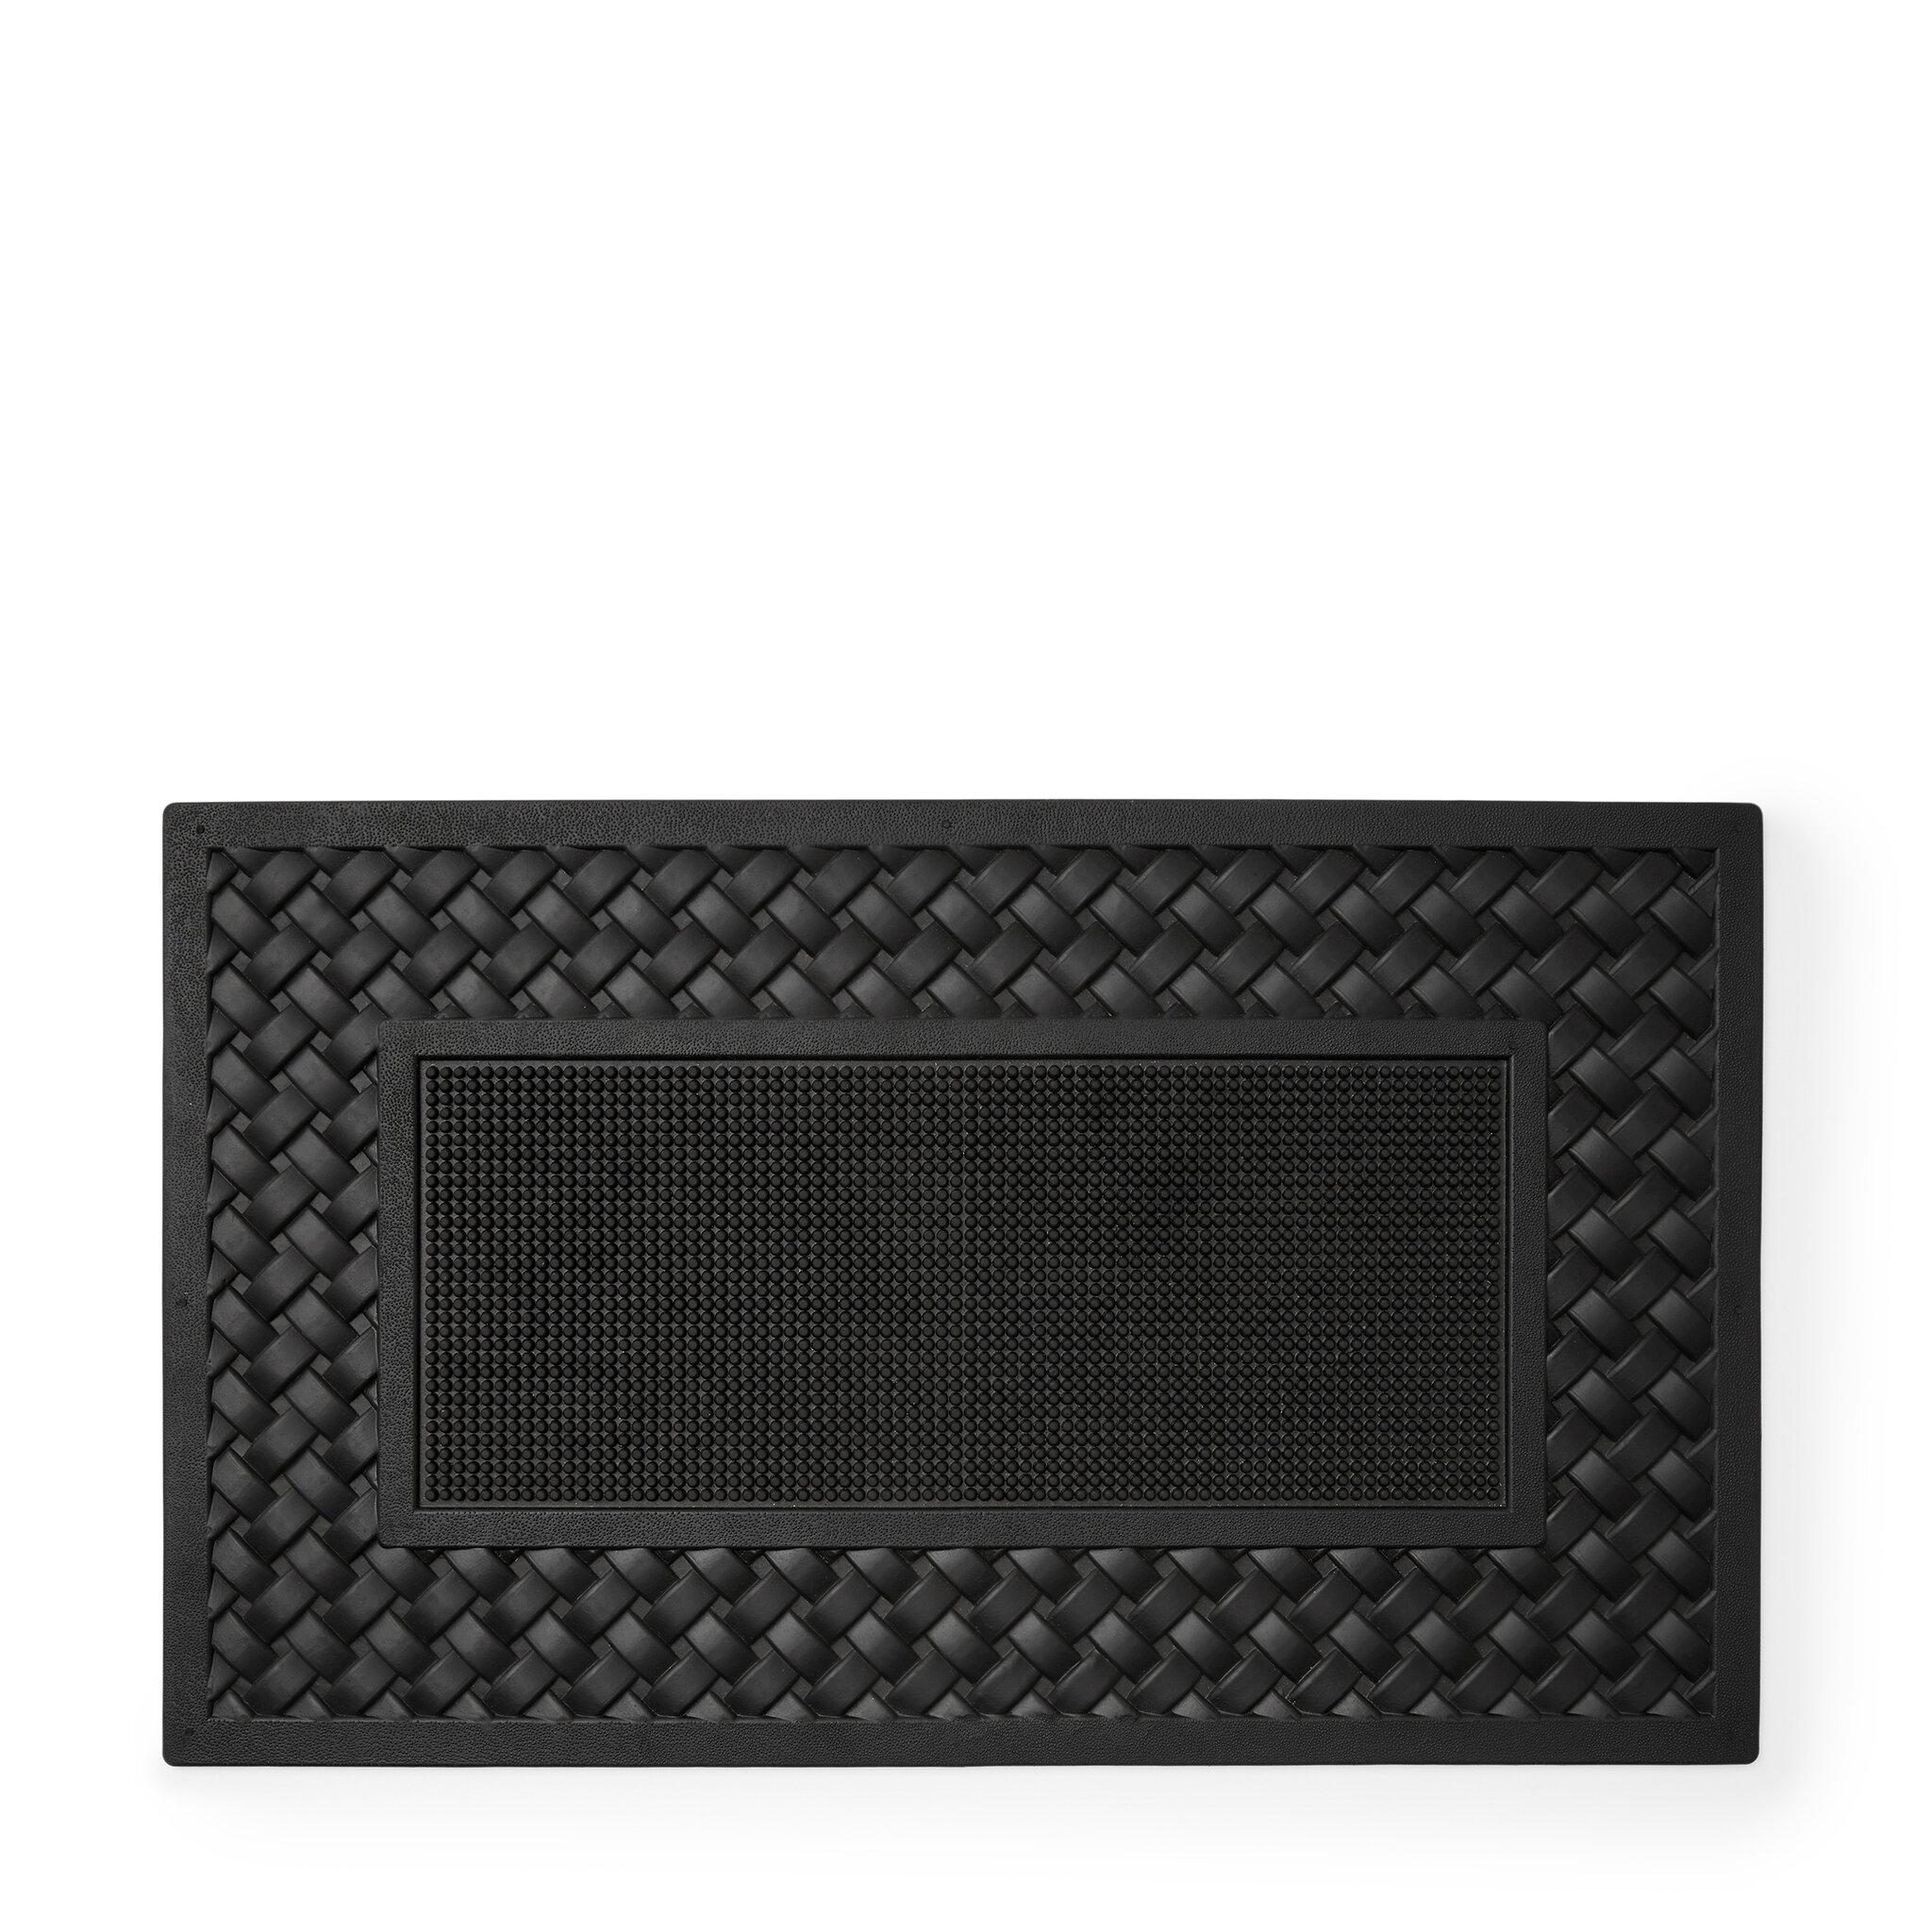 Helt nya Dörrmatta Gummi, 45x75 cm - Dörrmattor - Köp online på åhlens.se! QB-25